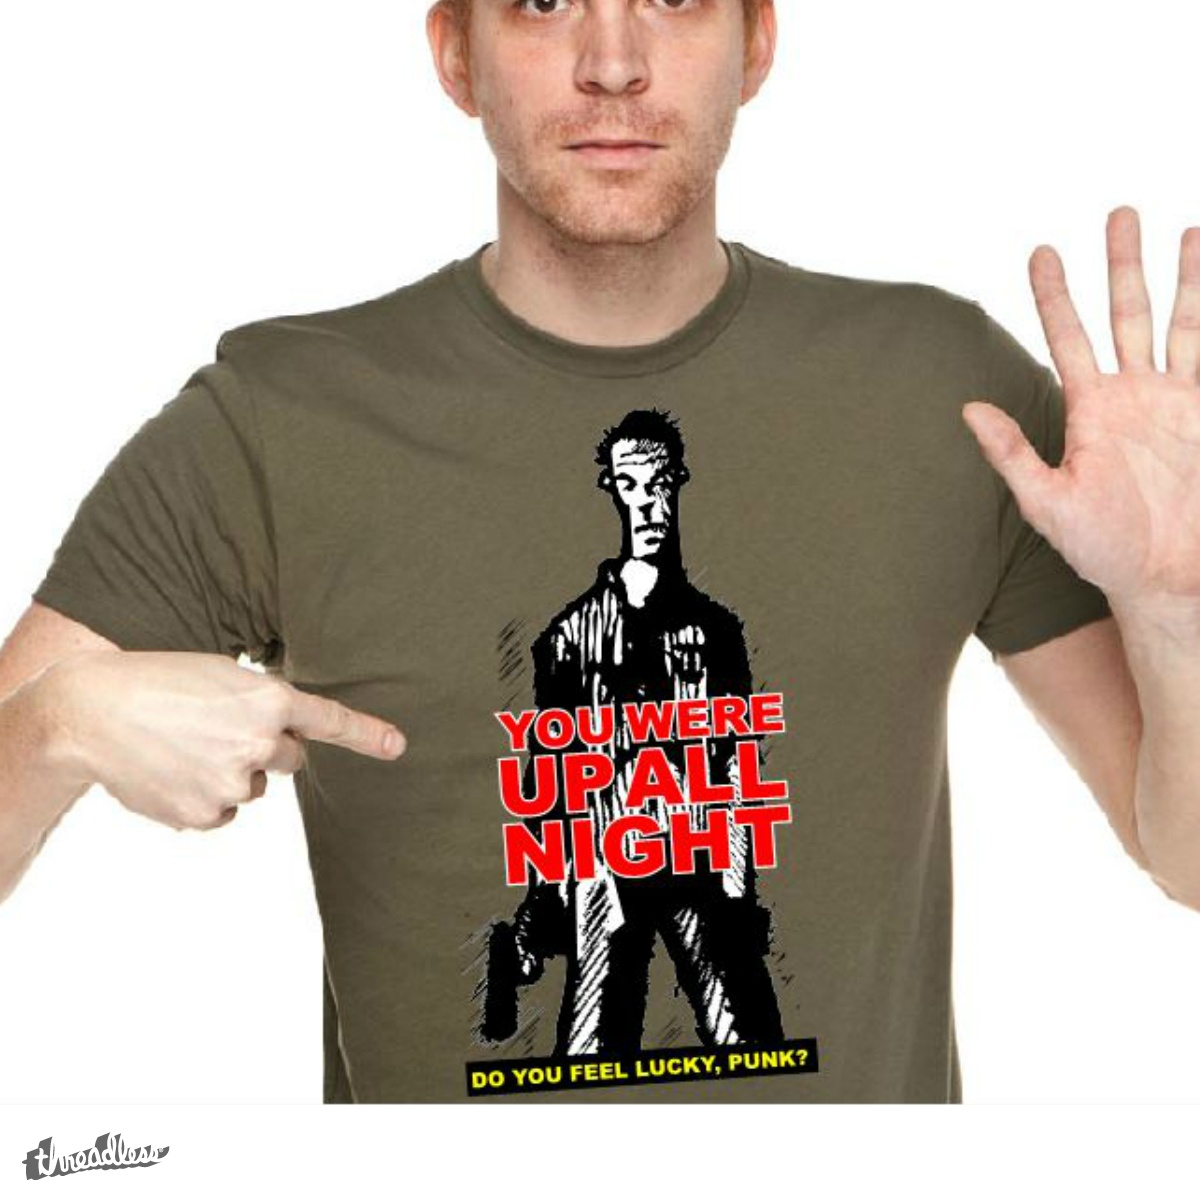 Do You Feel Lucky, a cool t-shirt design